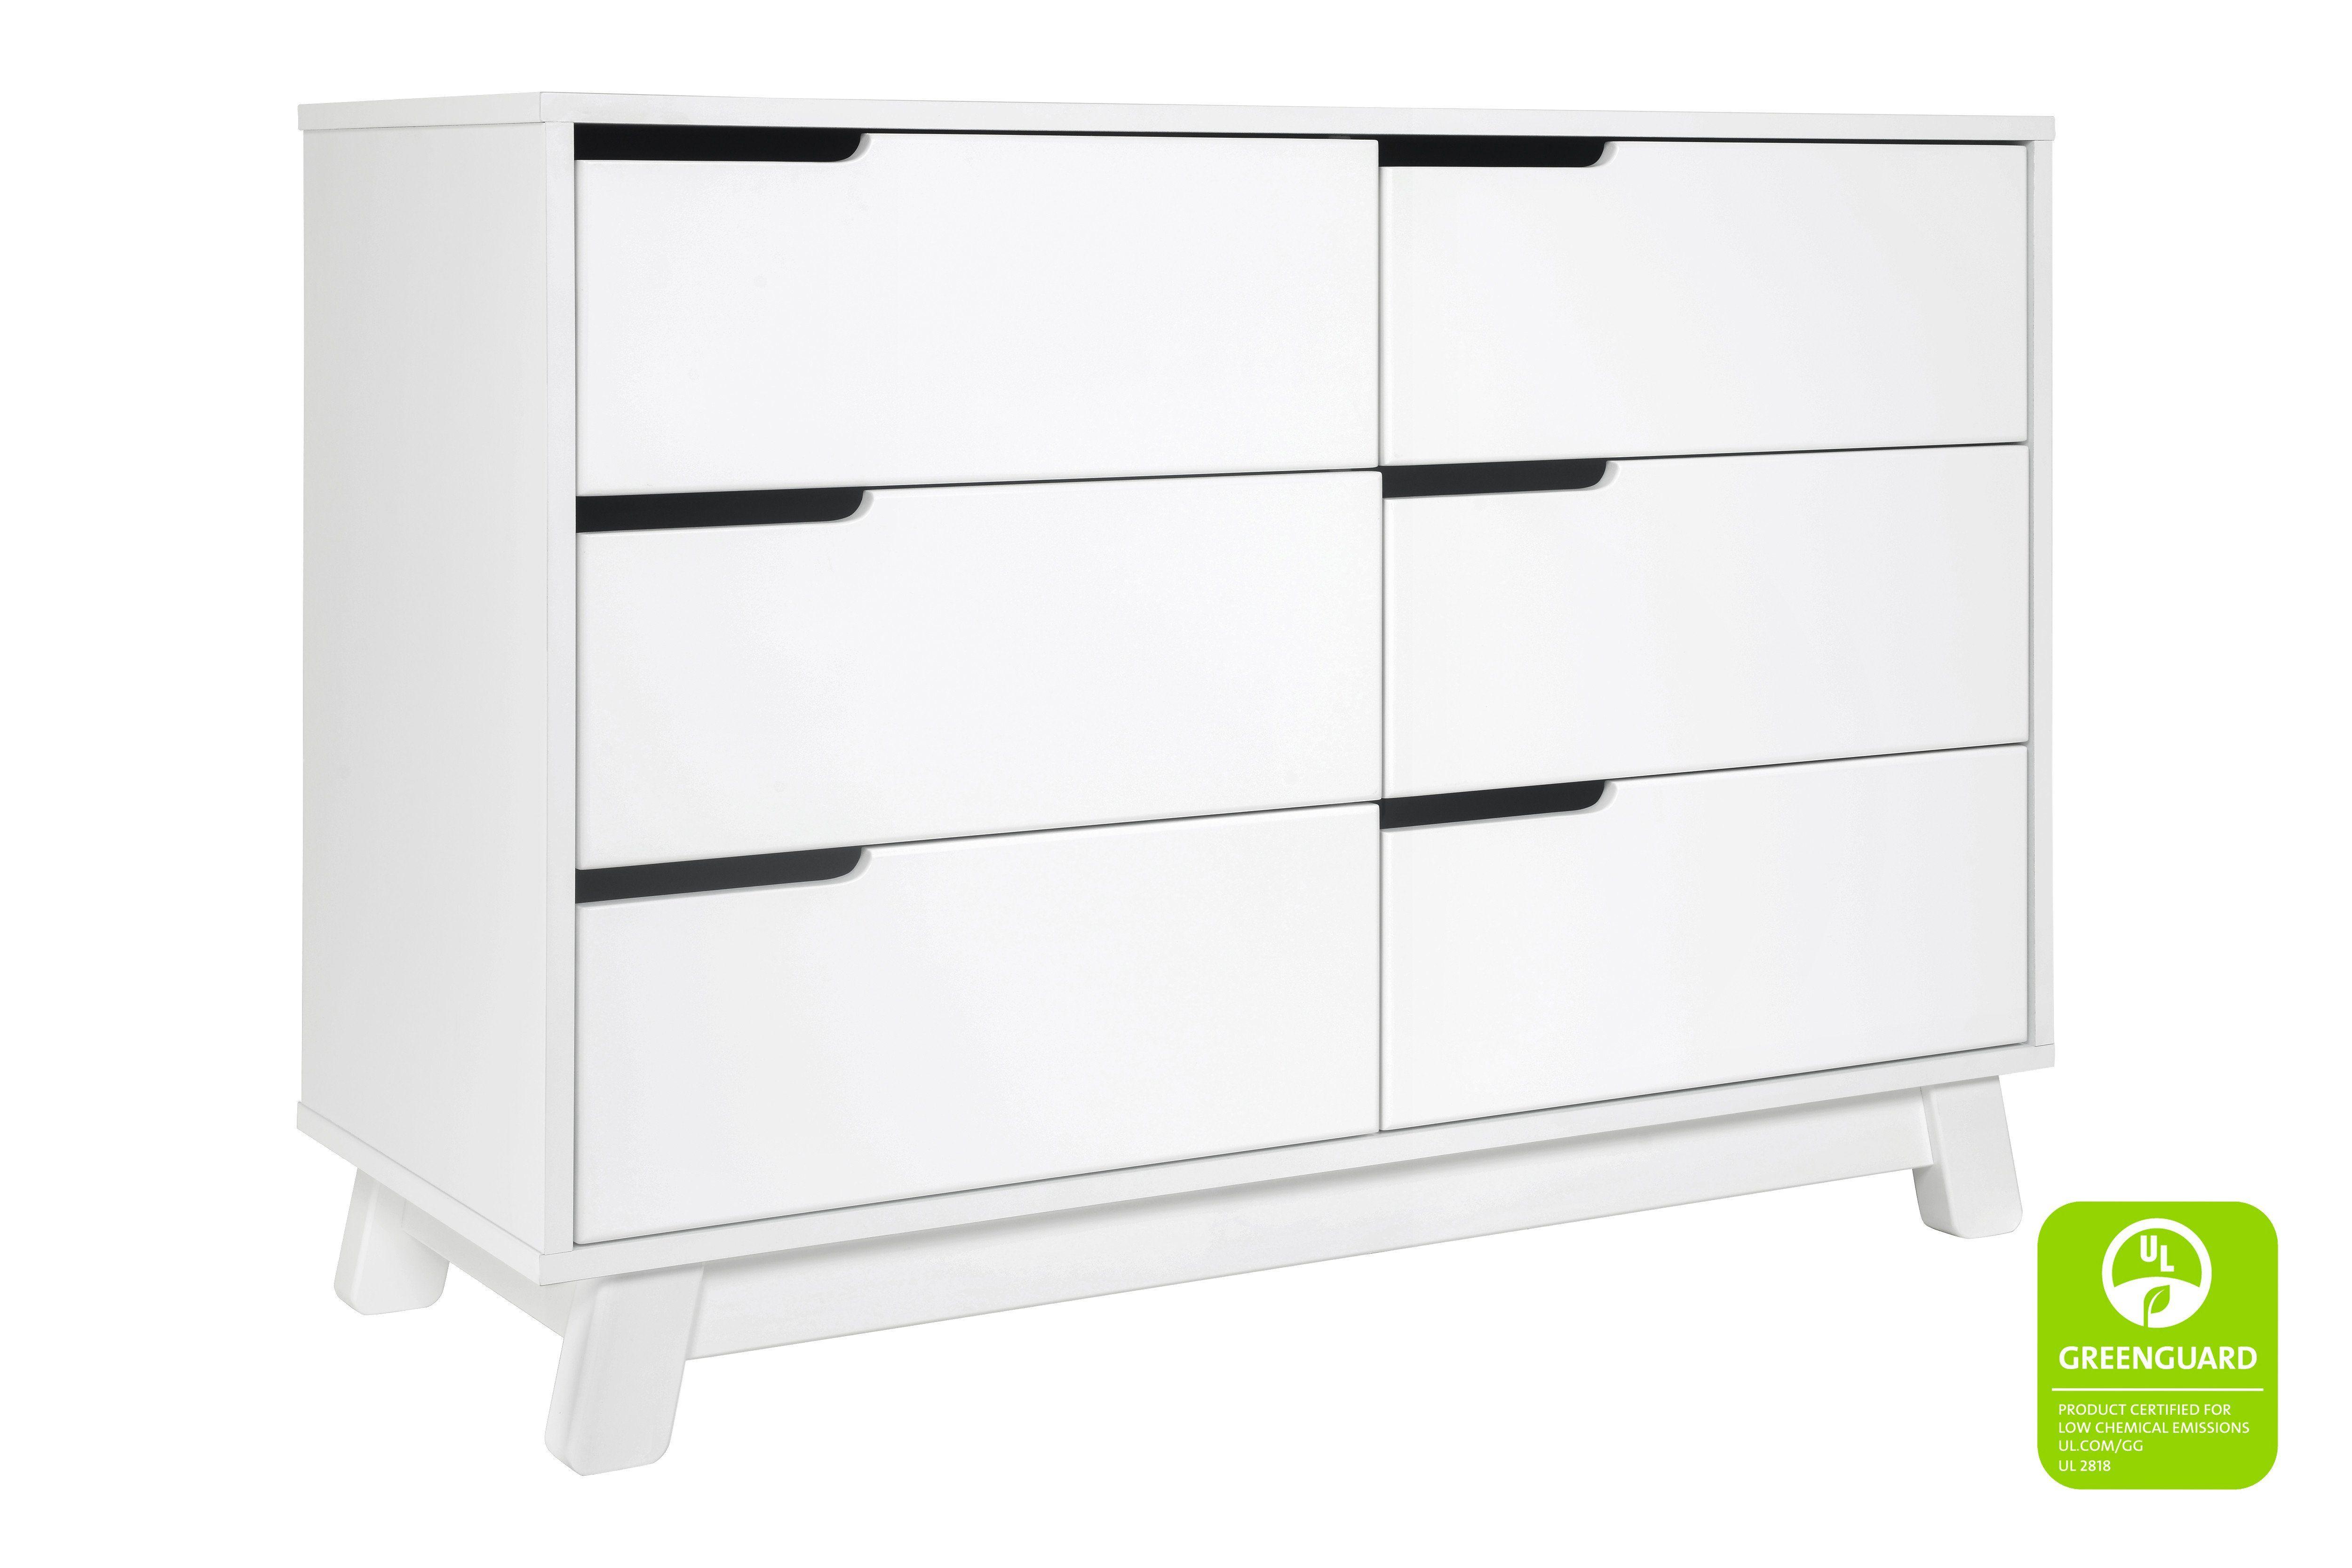 Hudson 6 Drawer Assembled Double Dresser In 2021 Double Dresser Drawers Stylish Nursery [ 3333 x 5000 Pixel ]